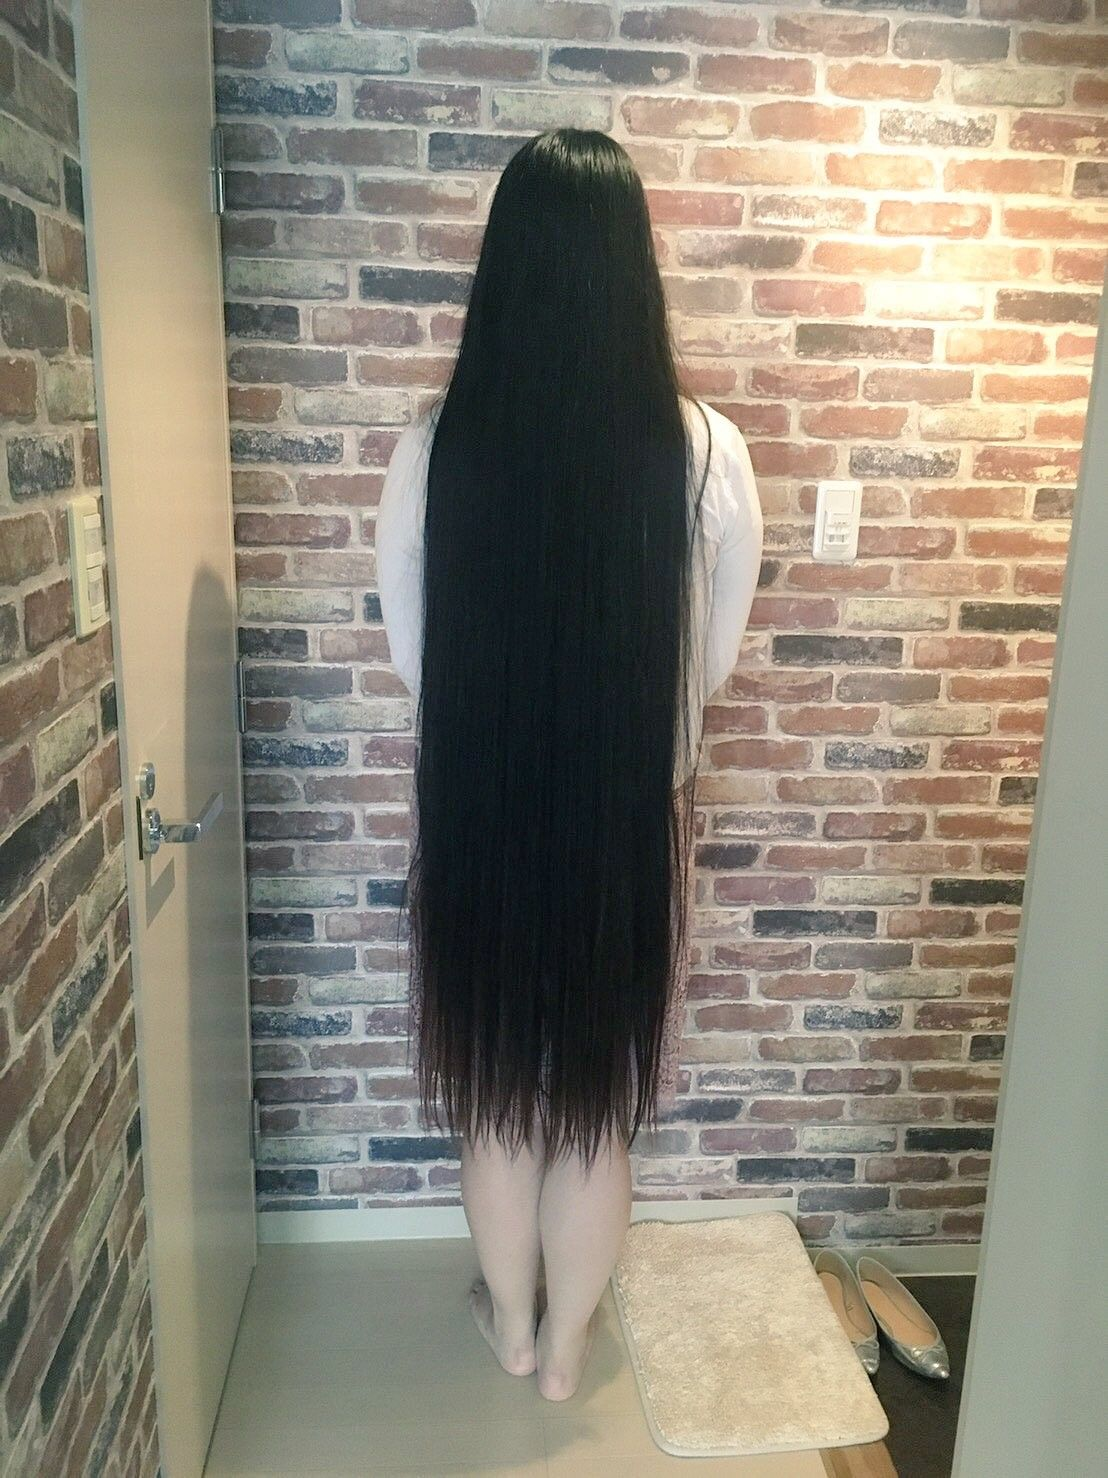 Pin oleh Terry Nugent di Asian women Rambut panjang